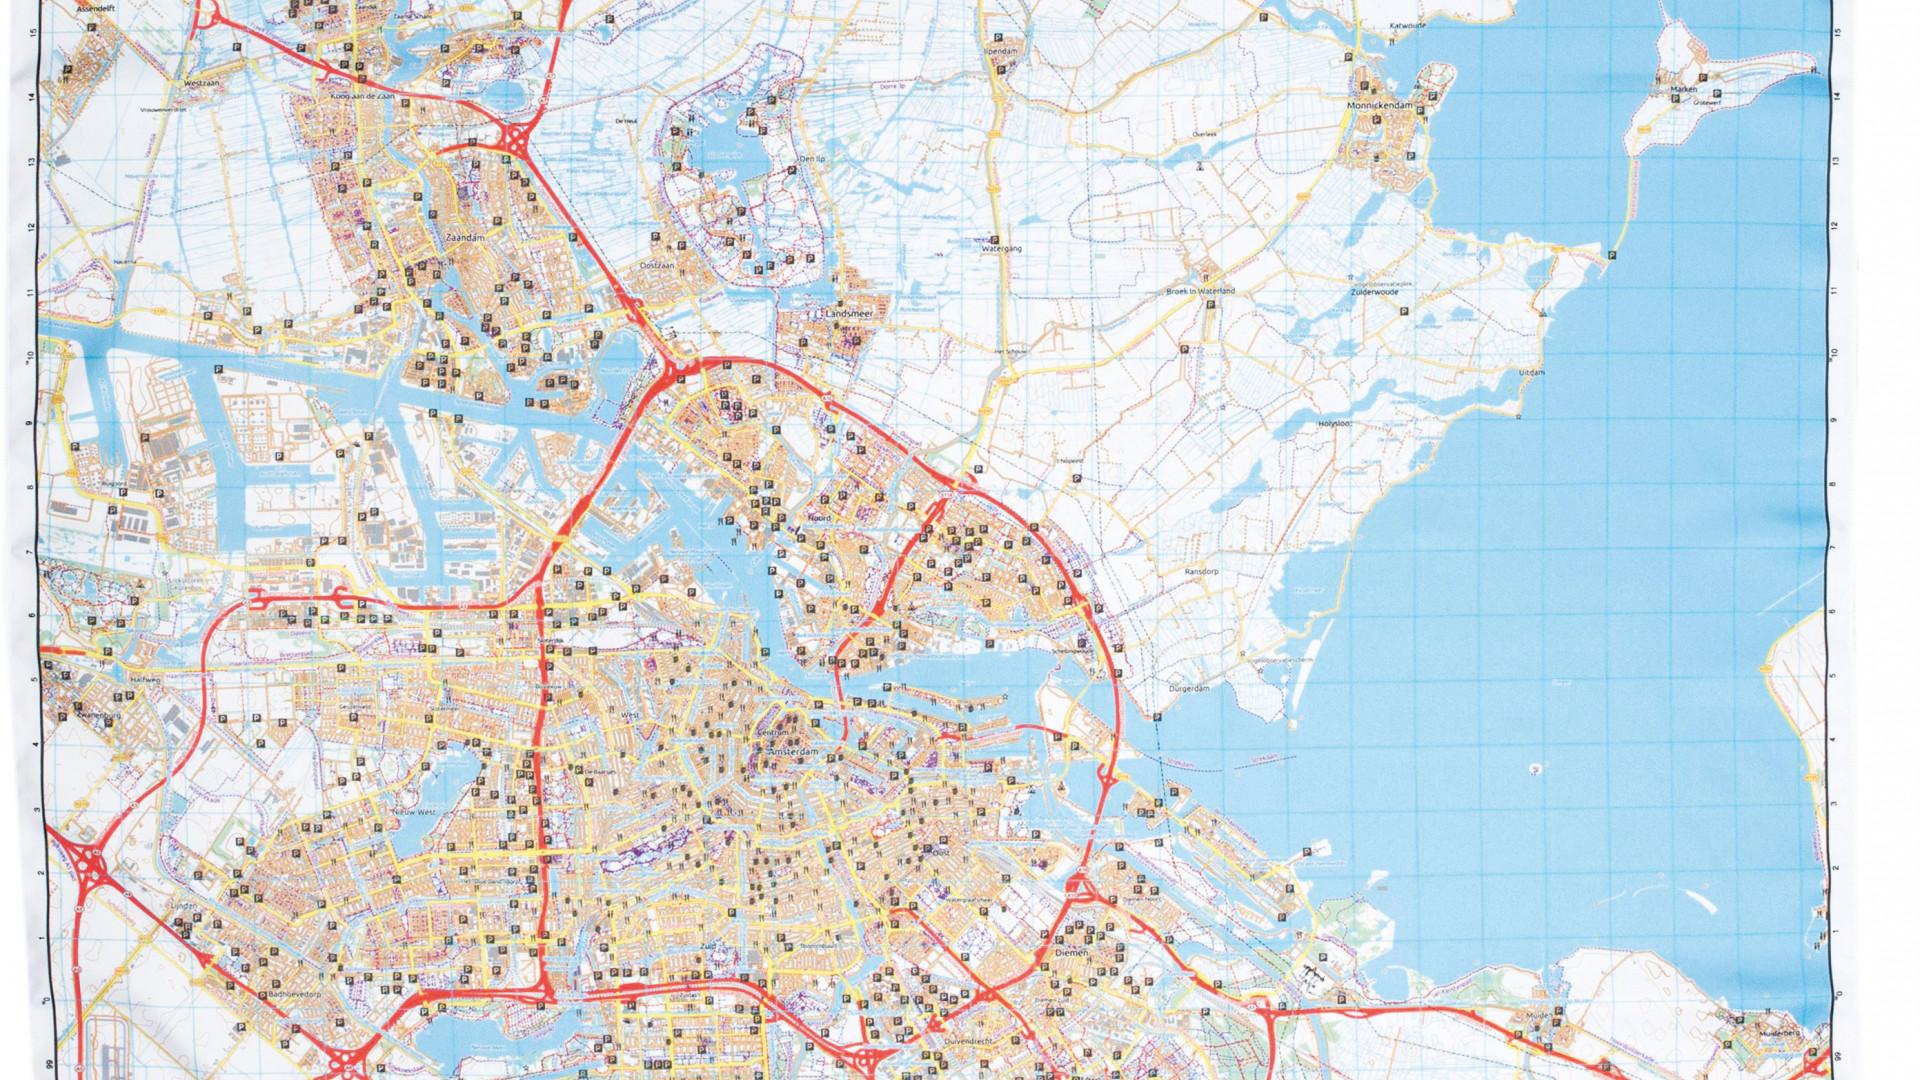 Amsterdam map wrap for toiletries